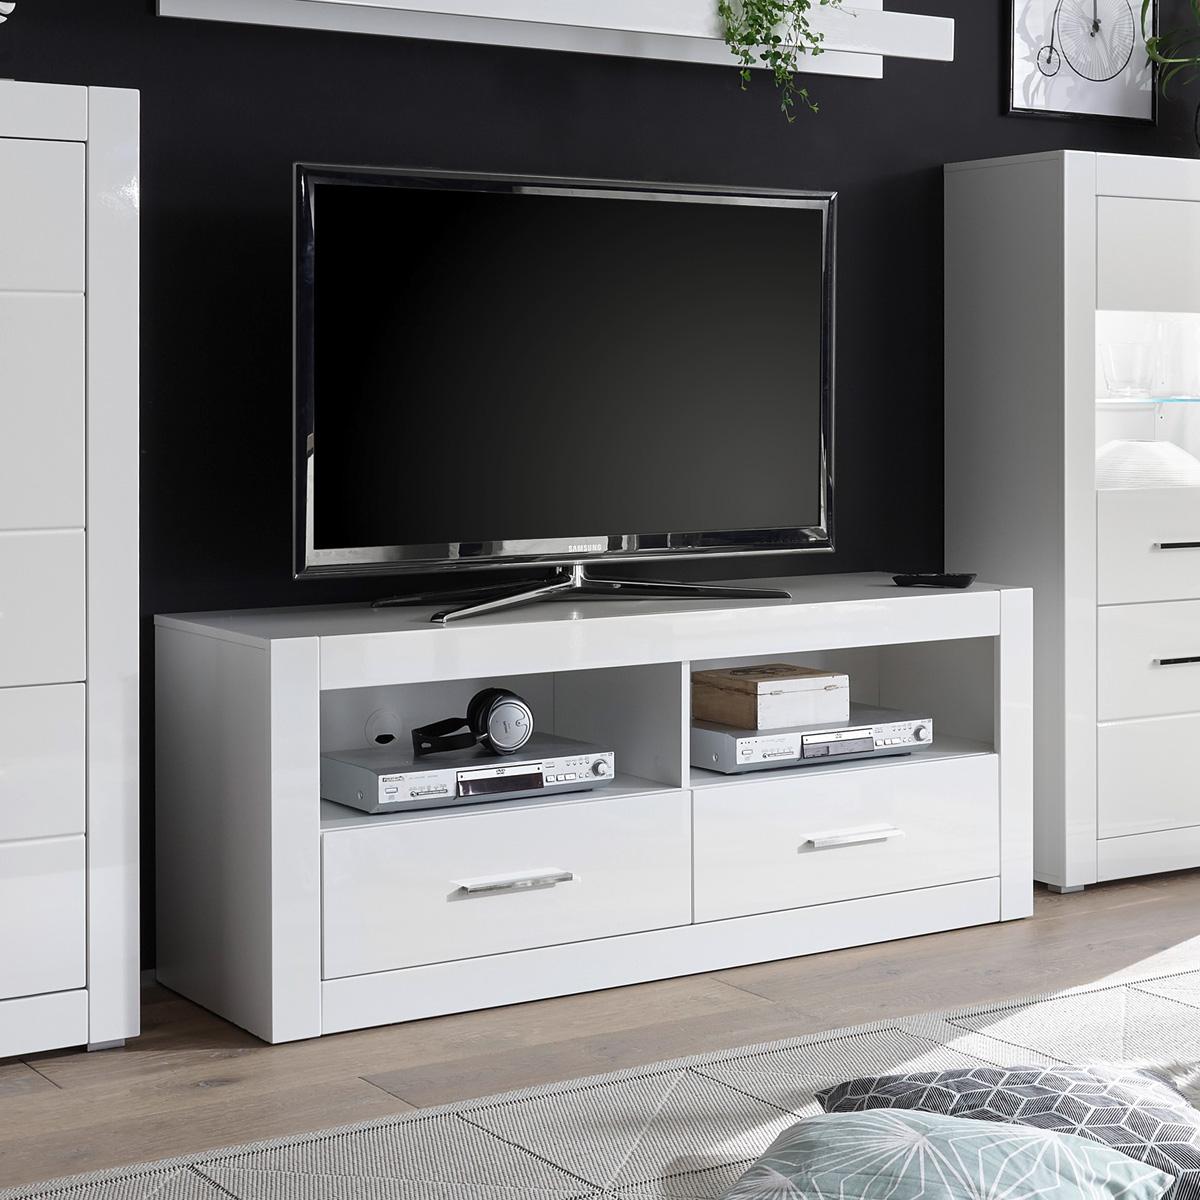 Fernsehschrank weiß  TV-Board Bianco Lowboard Unterschrank Fernsehschrank Kommode in weiß ...